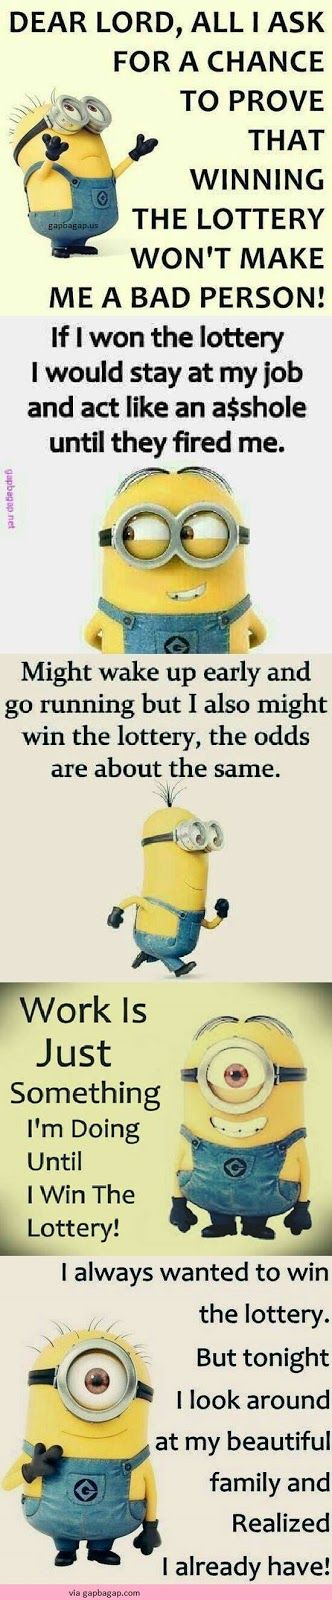 Top 5 Funniest Minion Jokes About Lottery